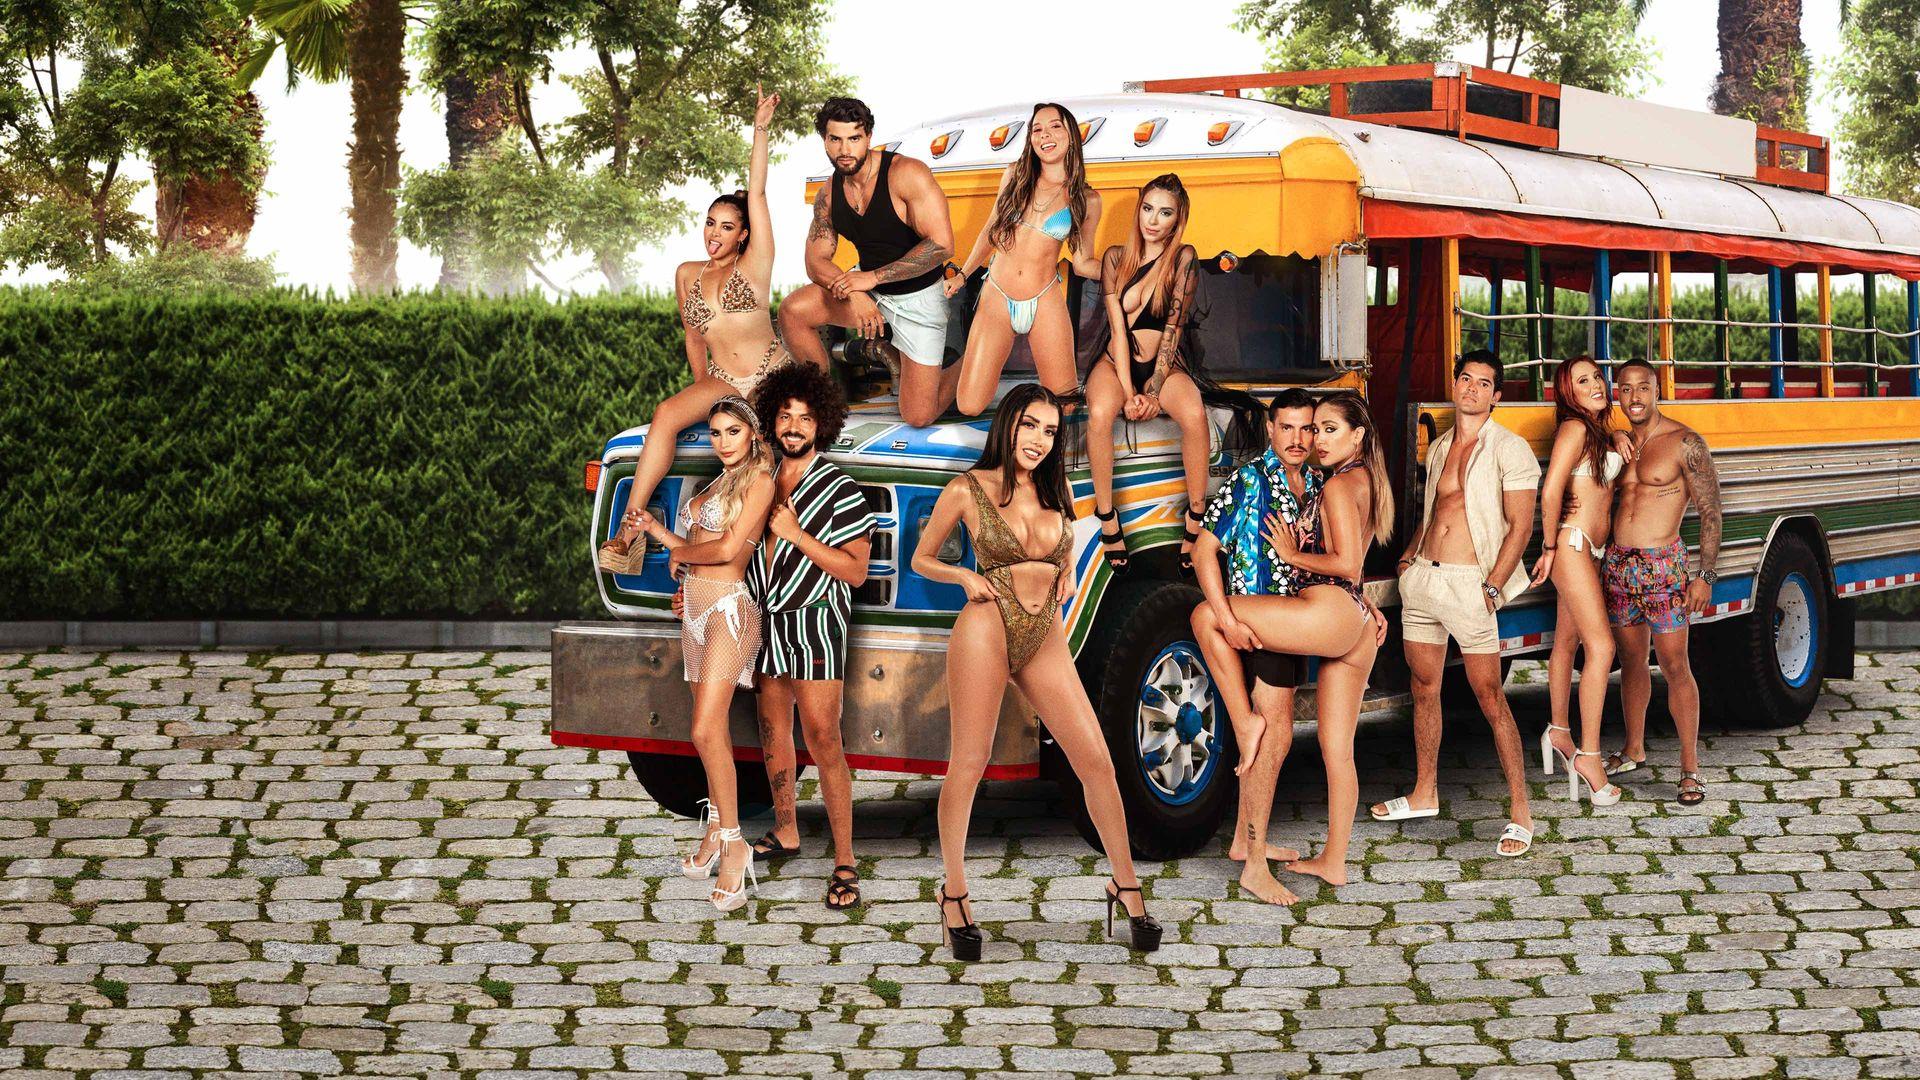 watch acapulco shore season 5 online free